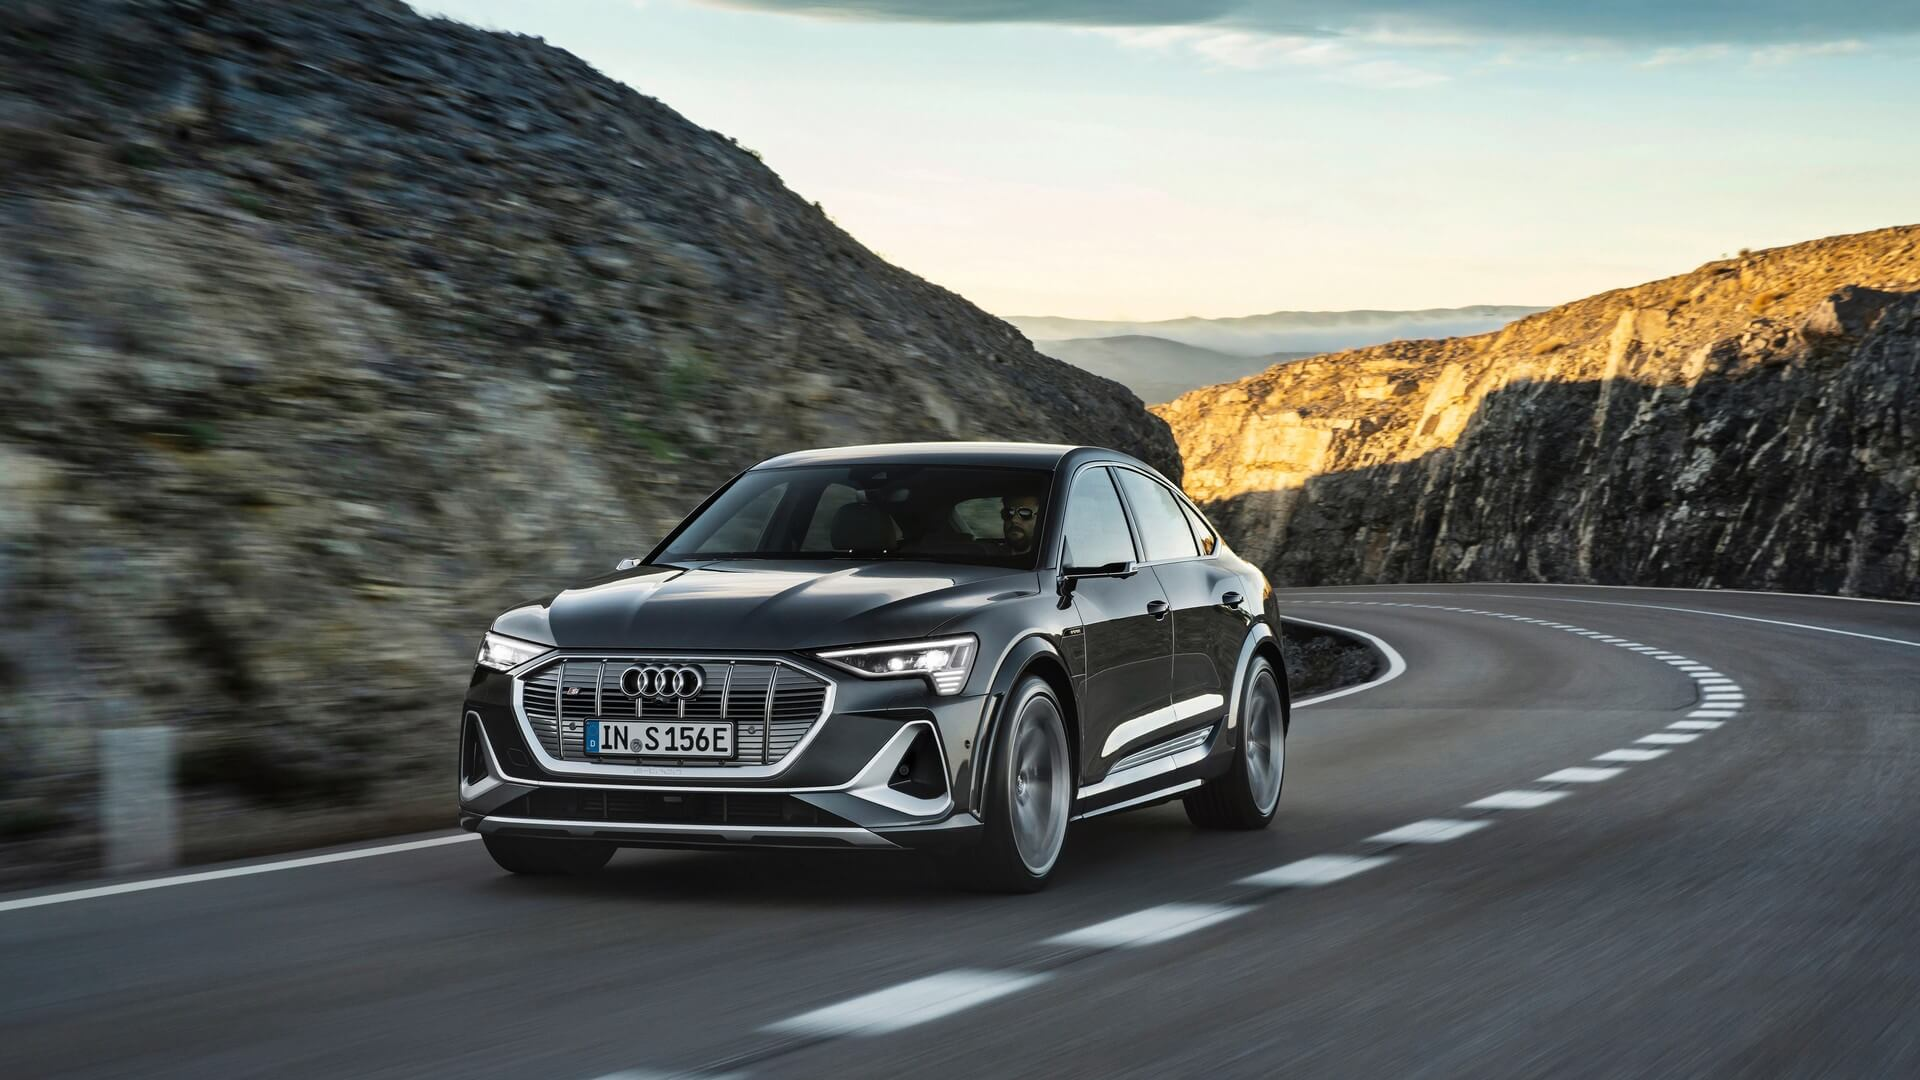 Audi-E-Tron-S-and-E-Tron-S-Sportback-2020-47